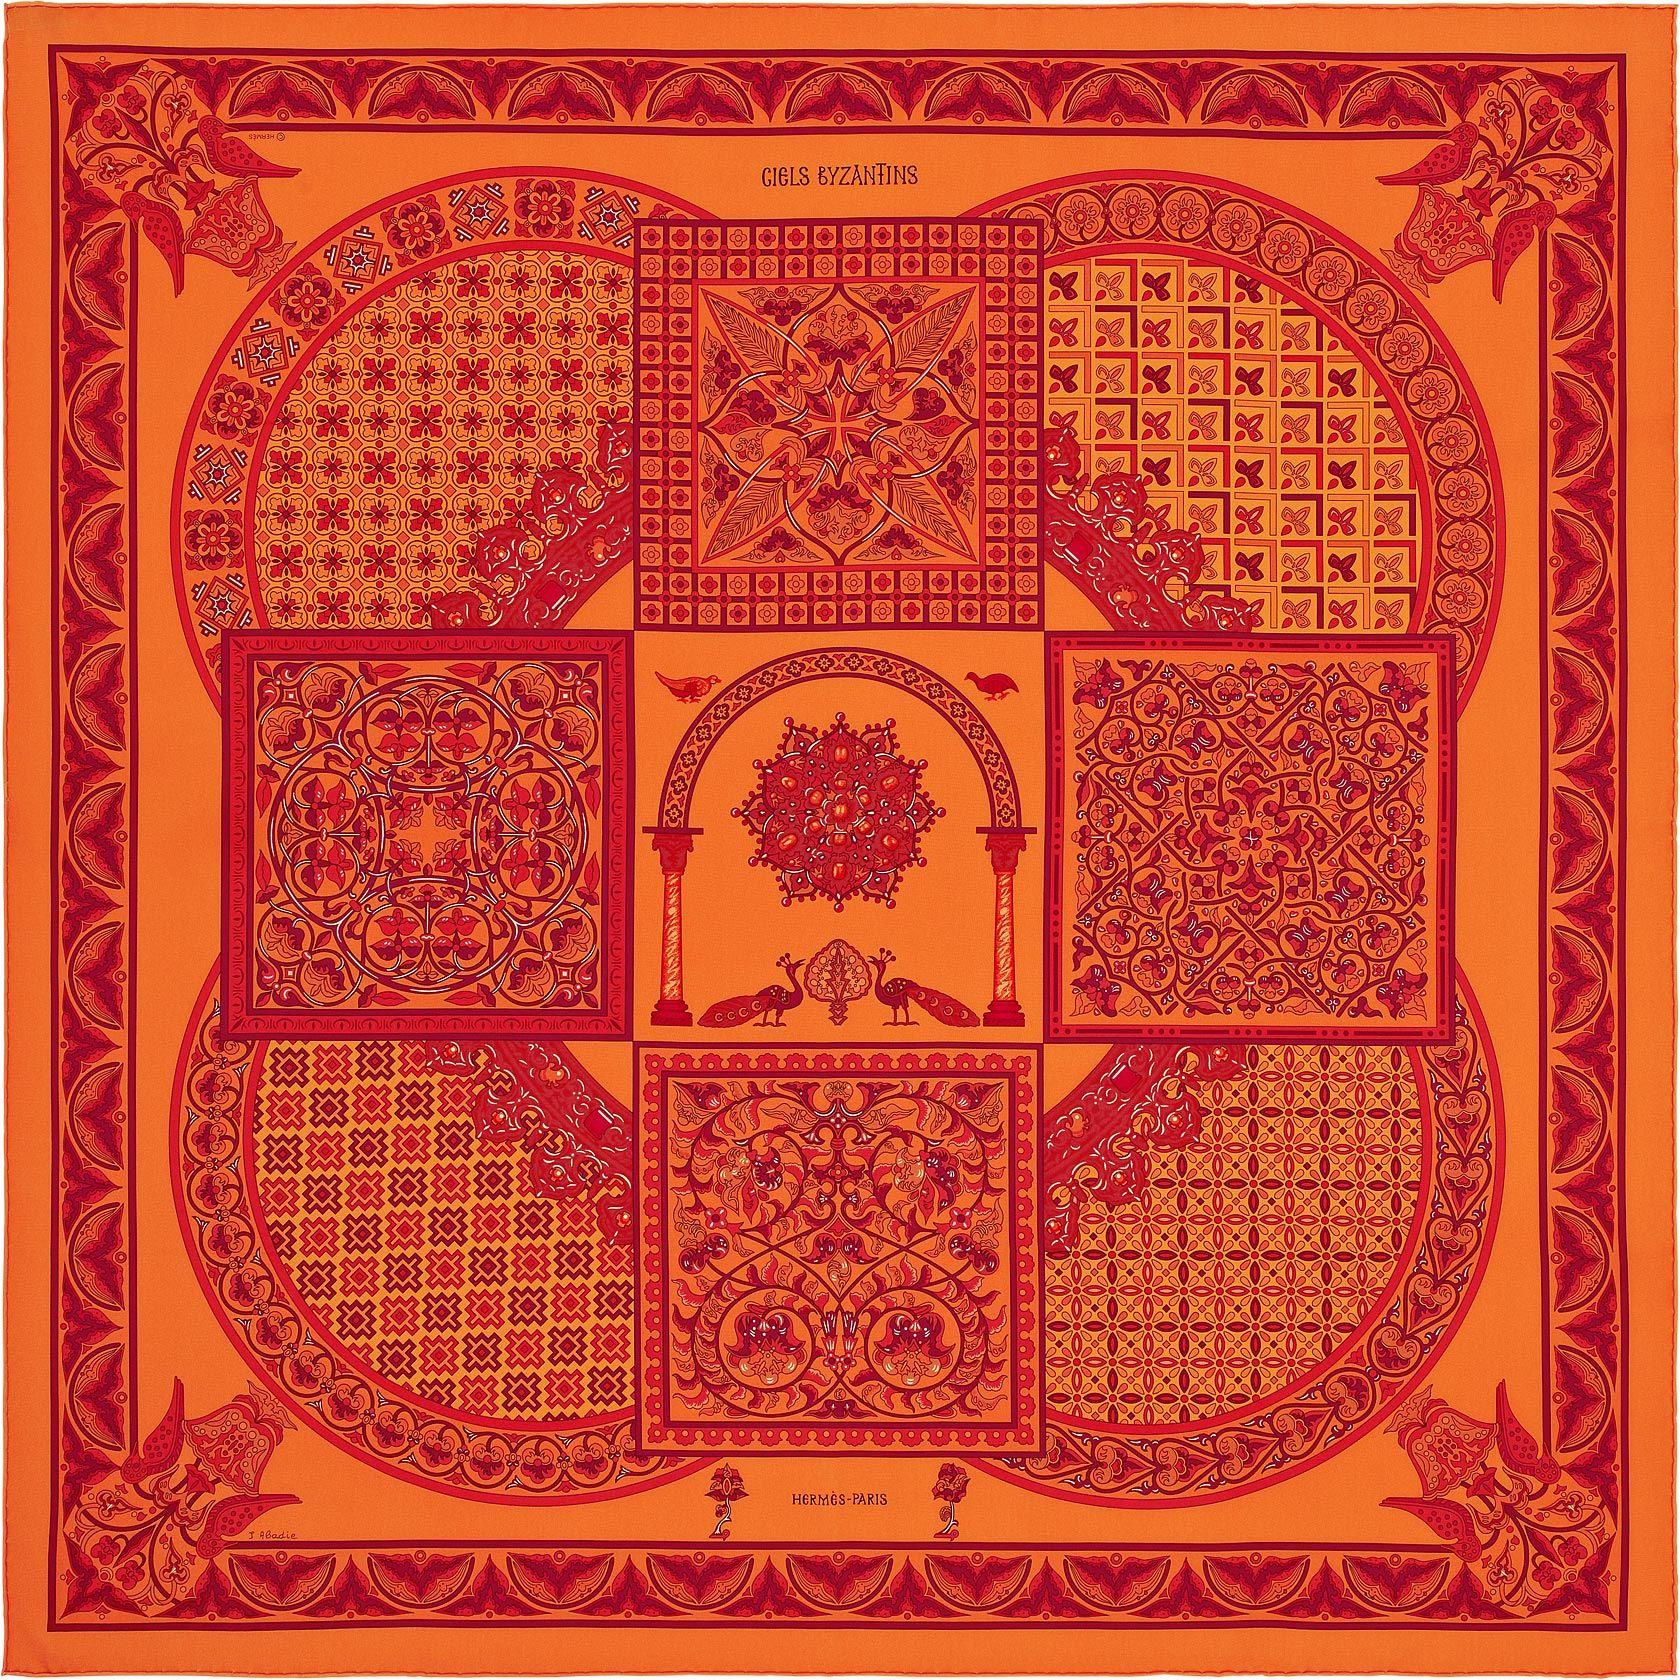 86ef0384fc46 Scarf 90 Hermès   Ciels Byzantins   Scarves   Hermes, Silk, Silk scarves